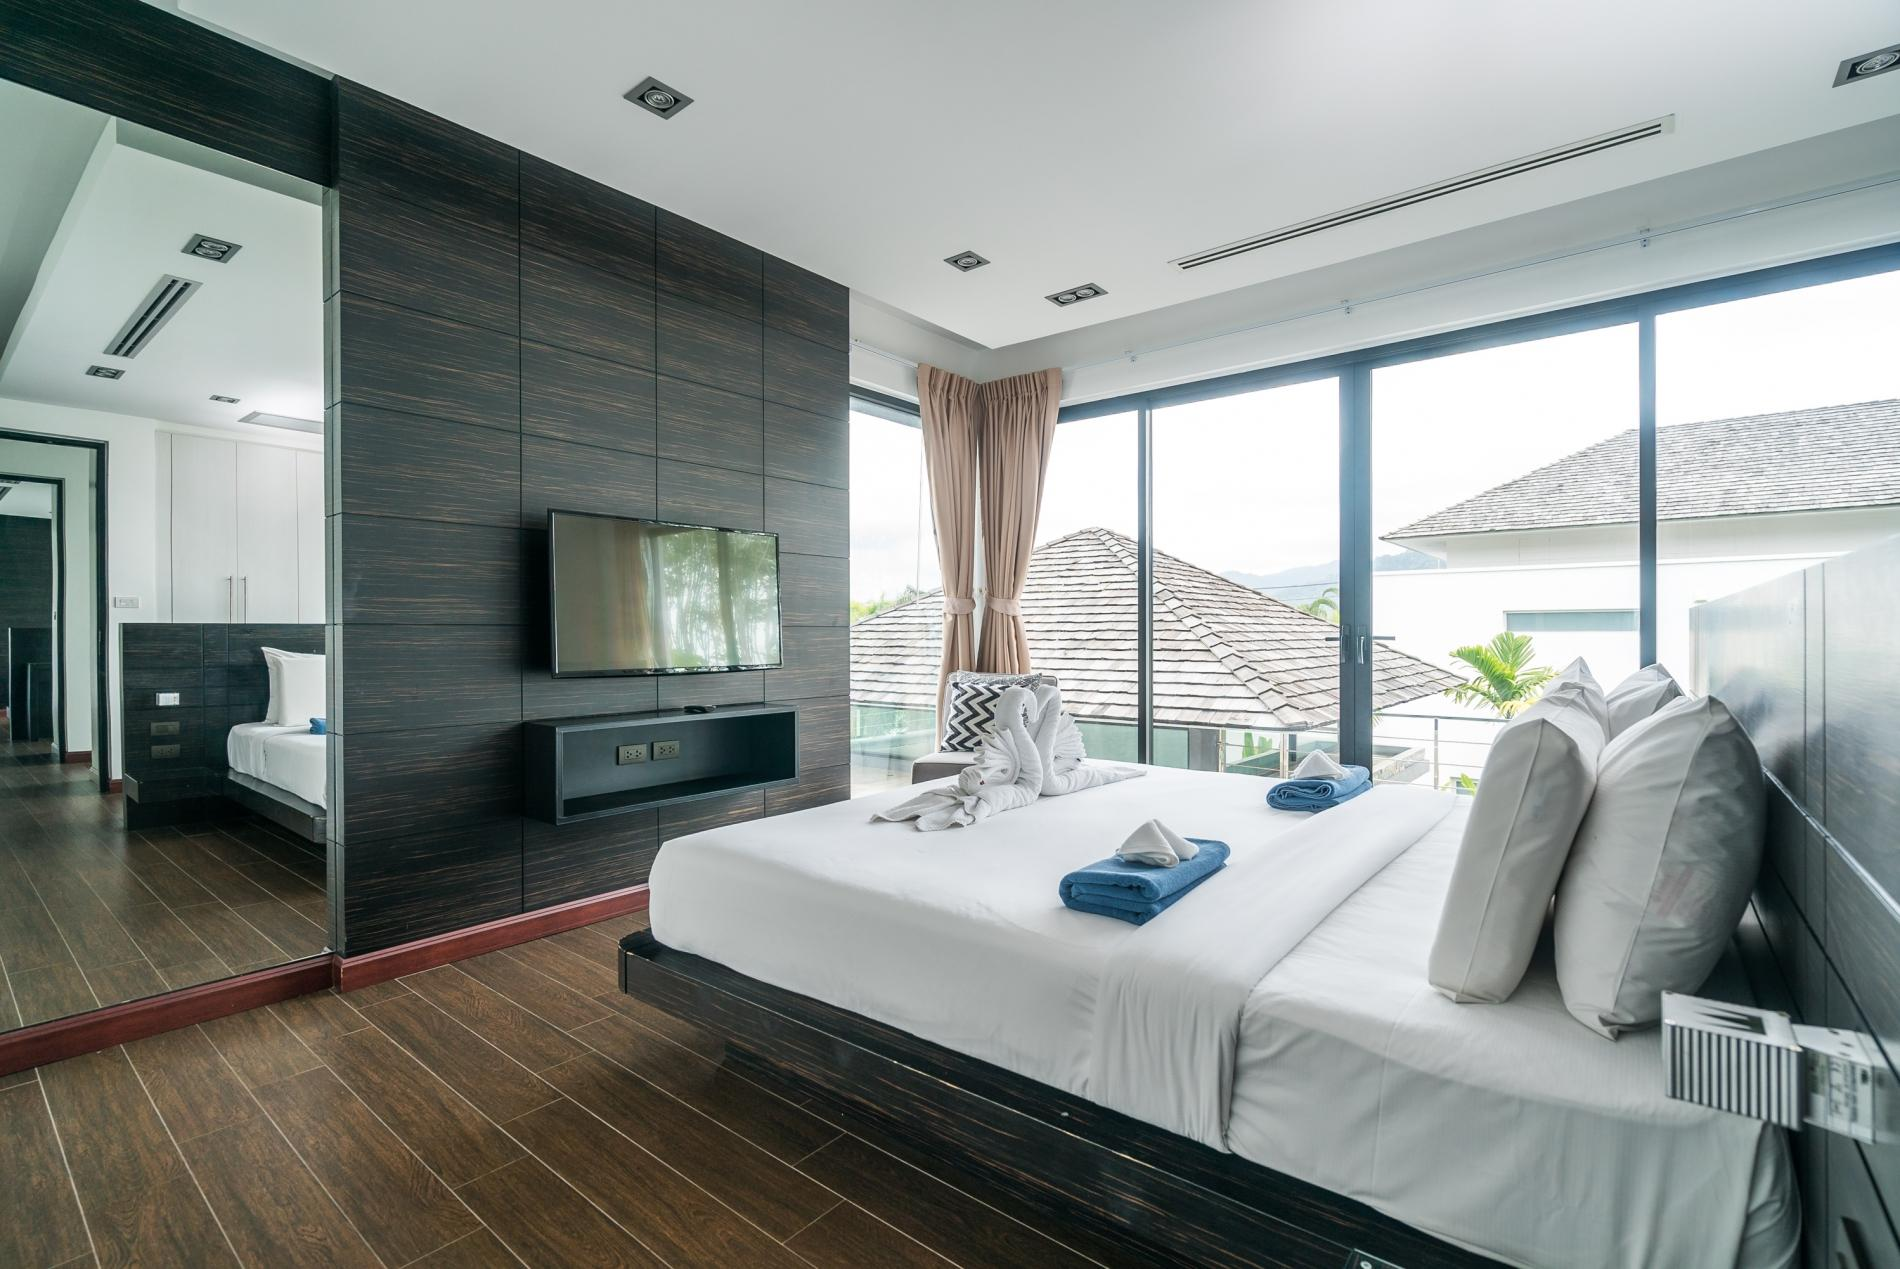 Apartment Diamond 272 - Modern 4 br private pool and garden villa photo 20320674